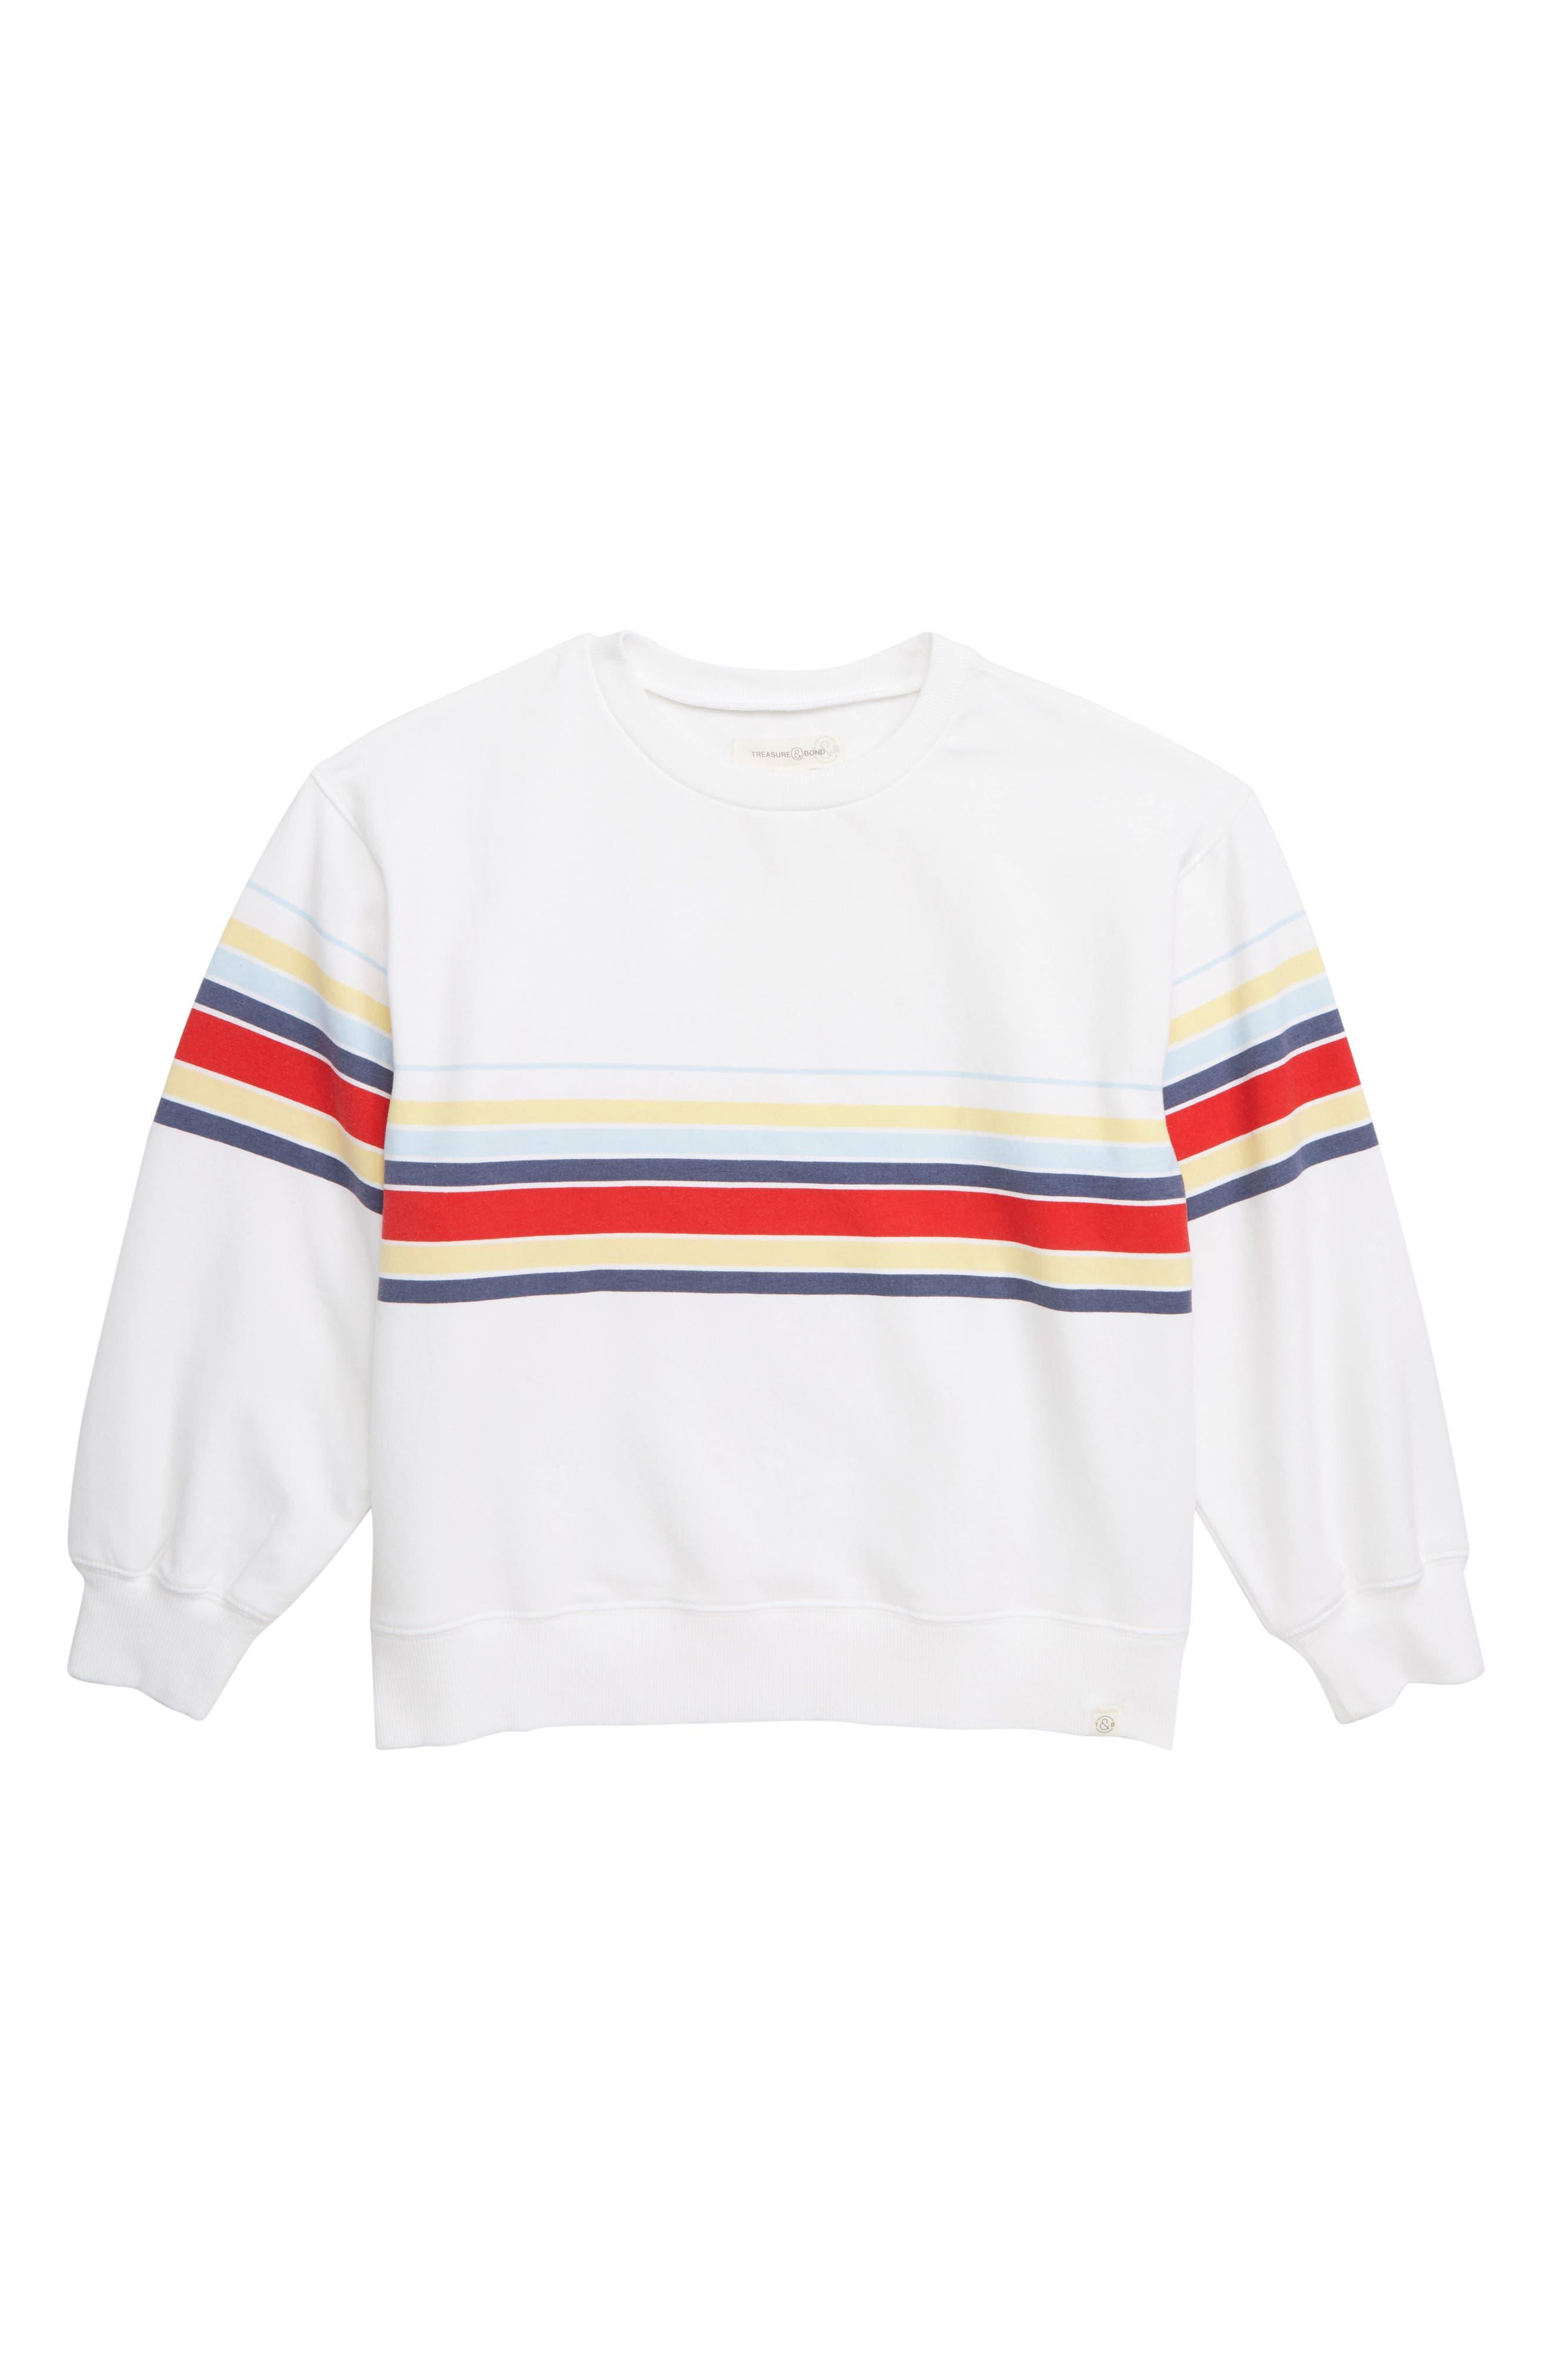 TREASURE & BOND,                             Oversized Sweatshirt,                             Main thumbnail 1, color,                             WHITE MALIBU STRIPE